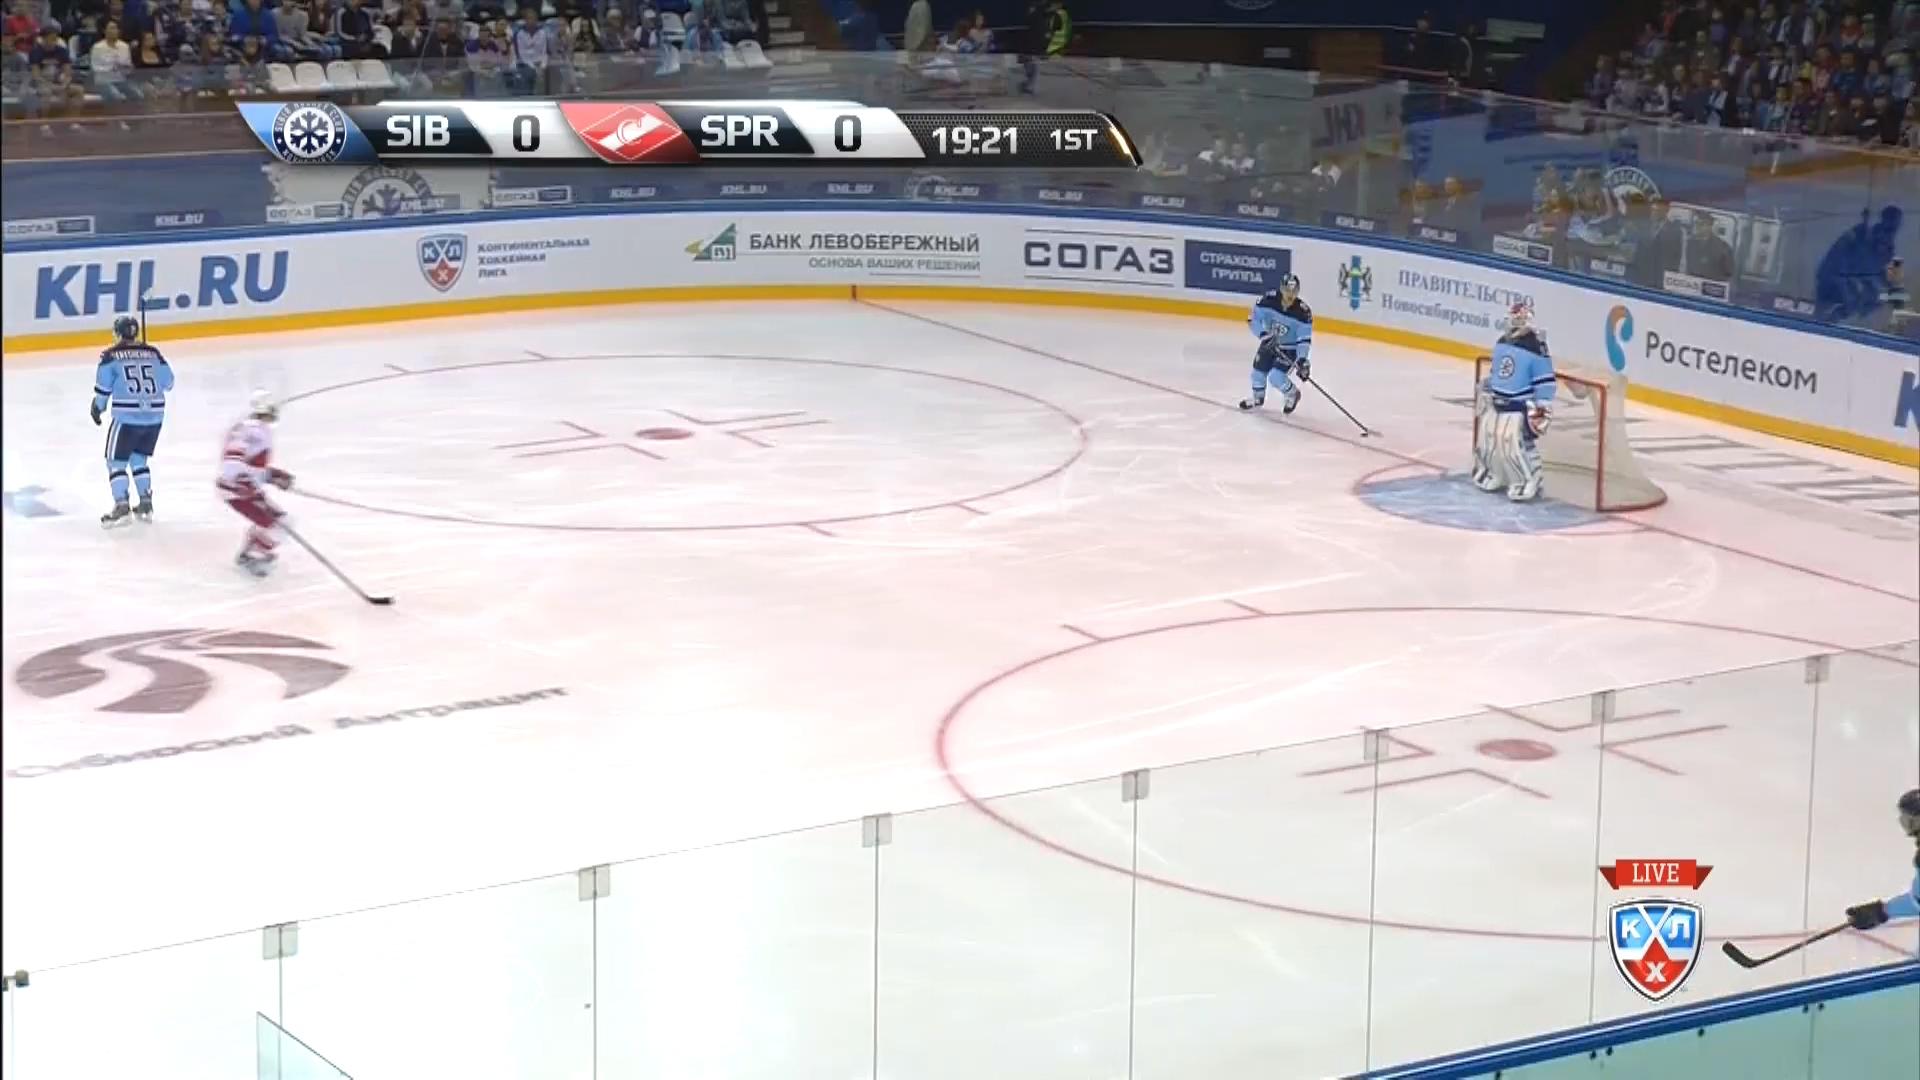 KHL.2015.09.06.Sibir@Spartak.1080p25.mkv_20150906_224415.000.jpg